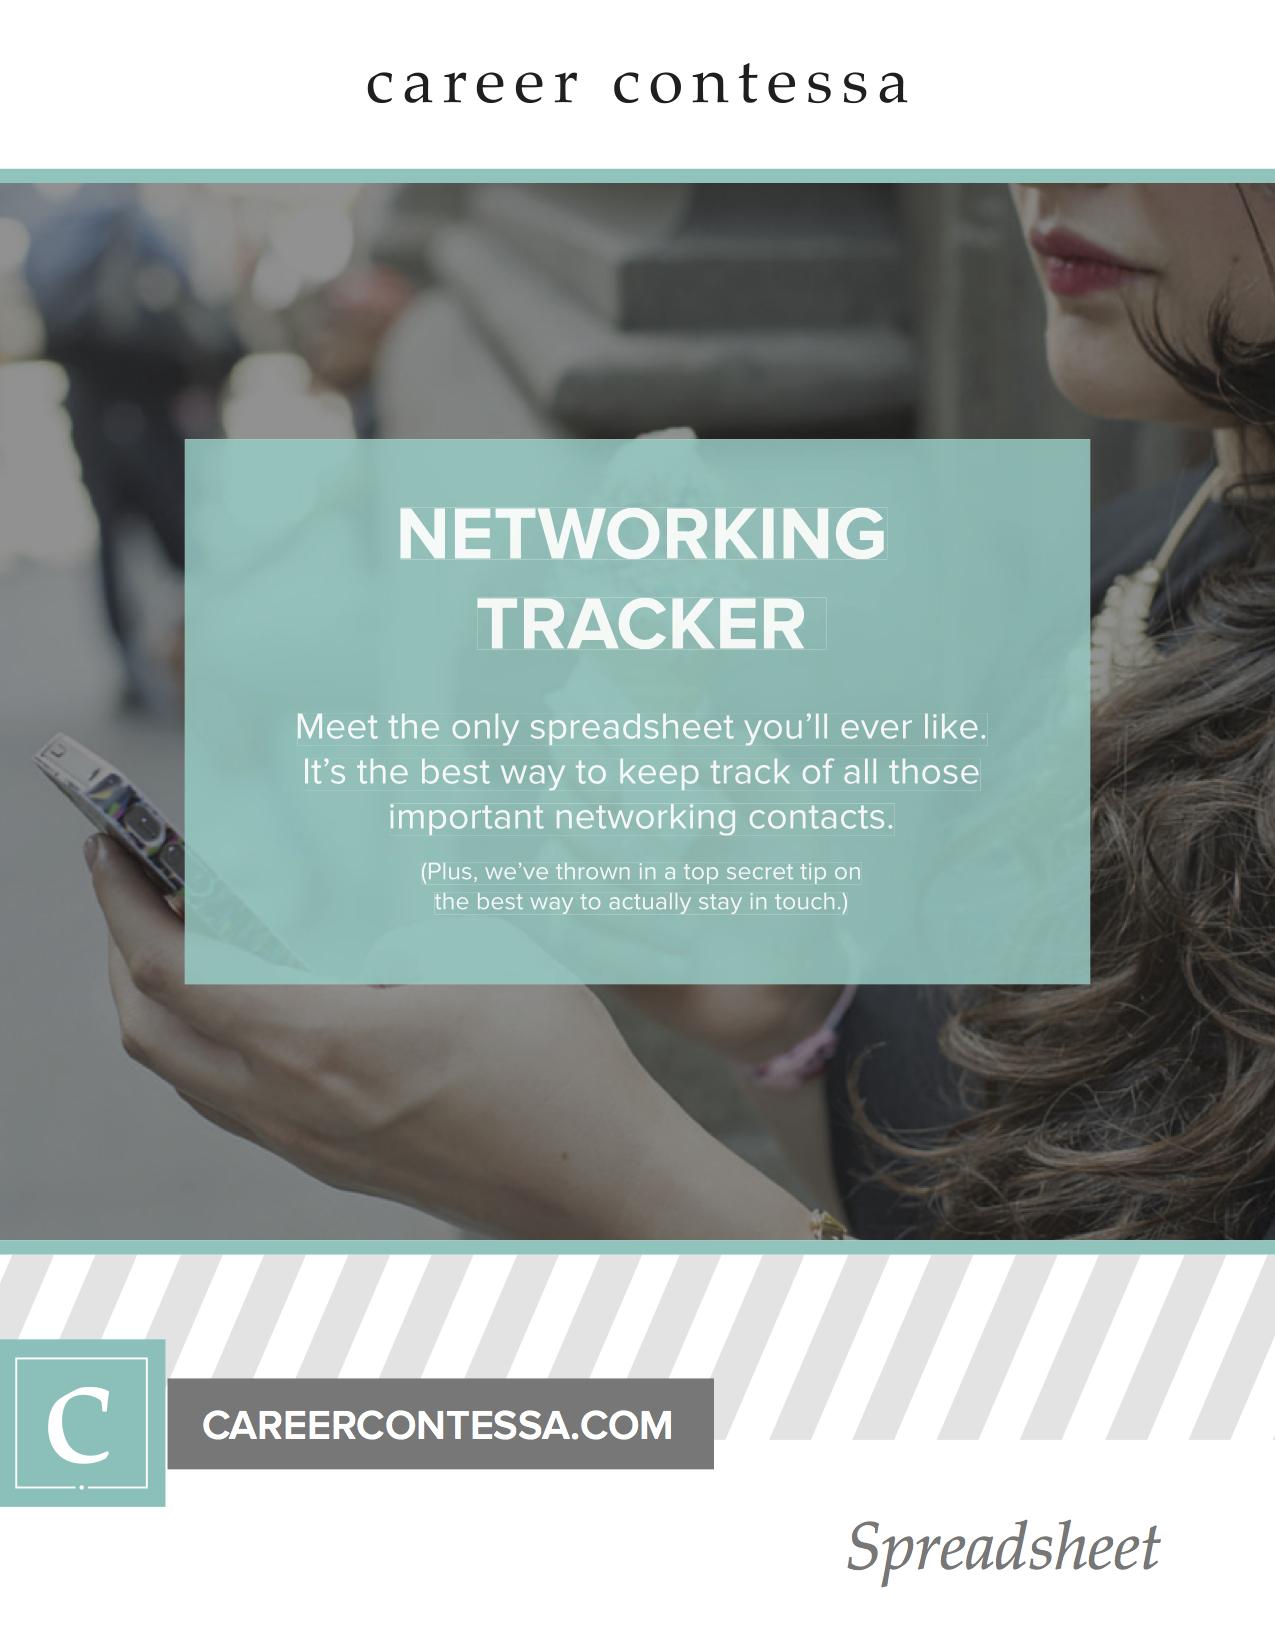 networking tracker 5 ways volunteering help land job